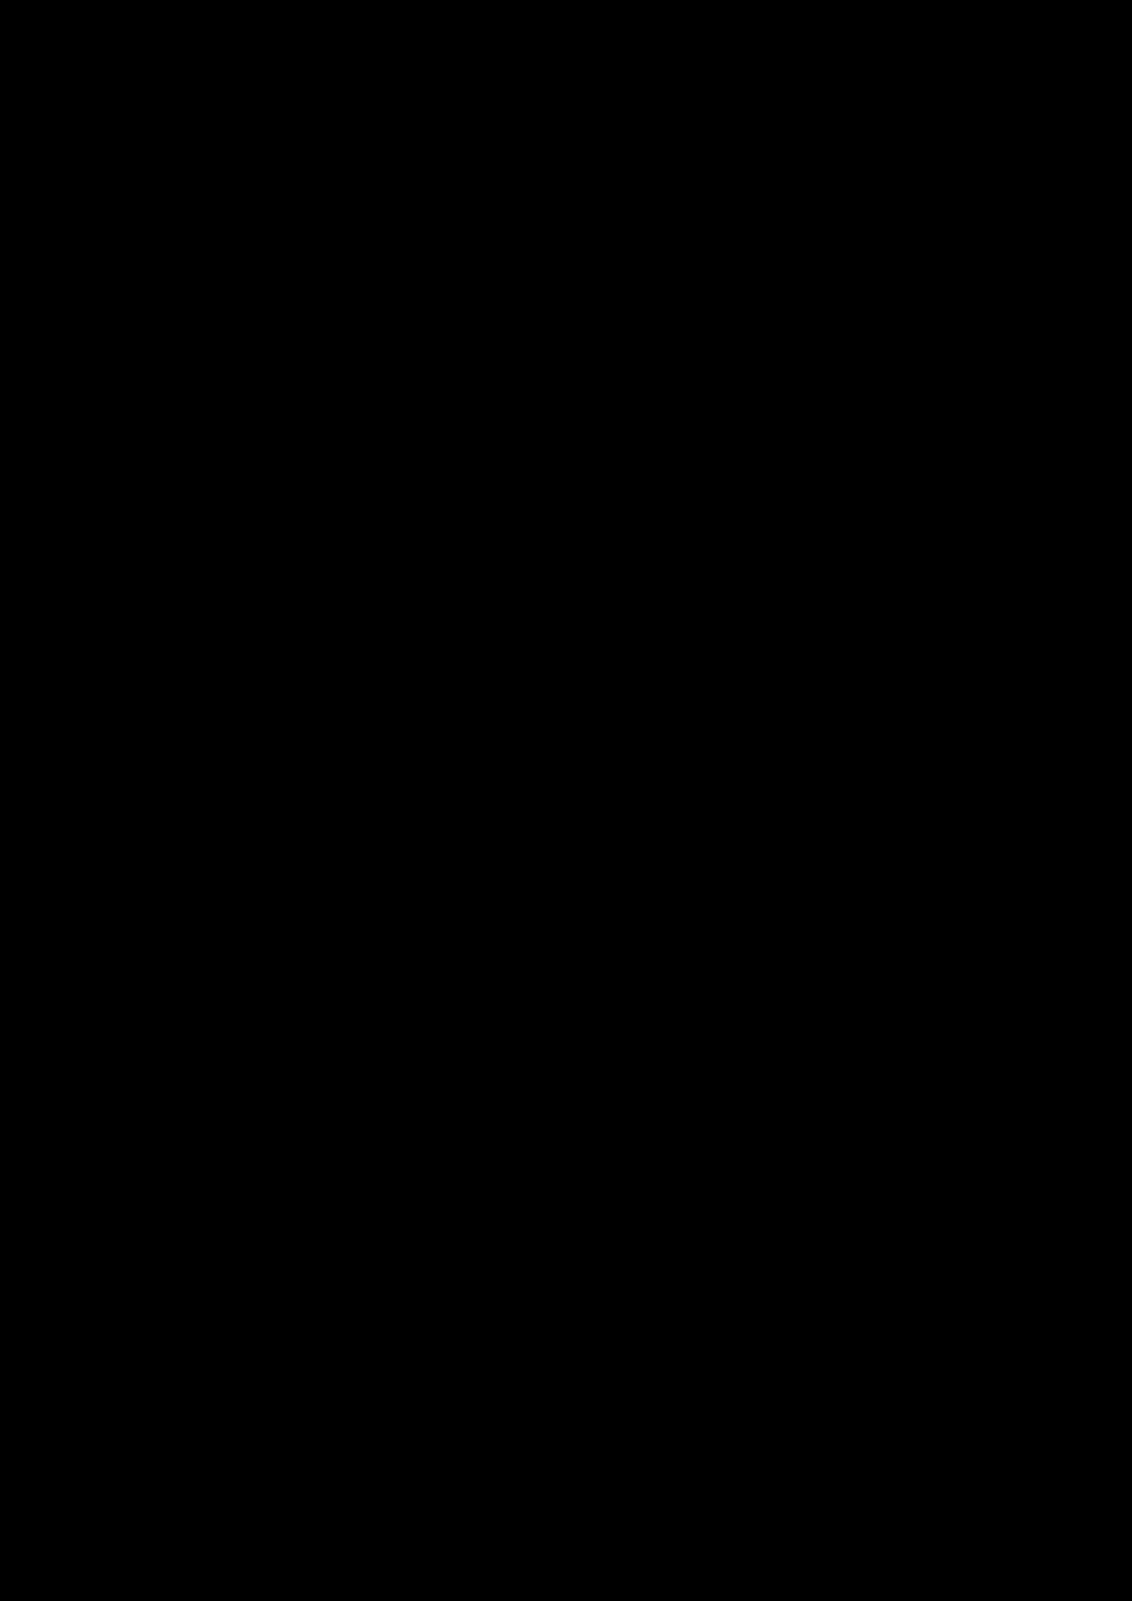 18 berez slide, Image 2